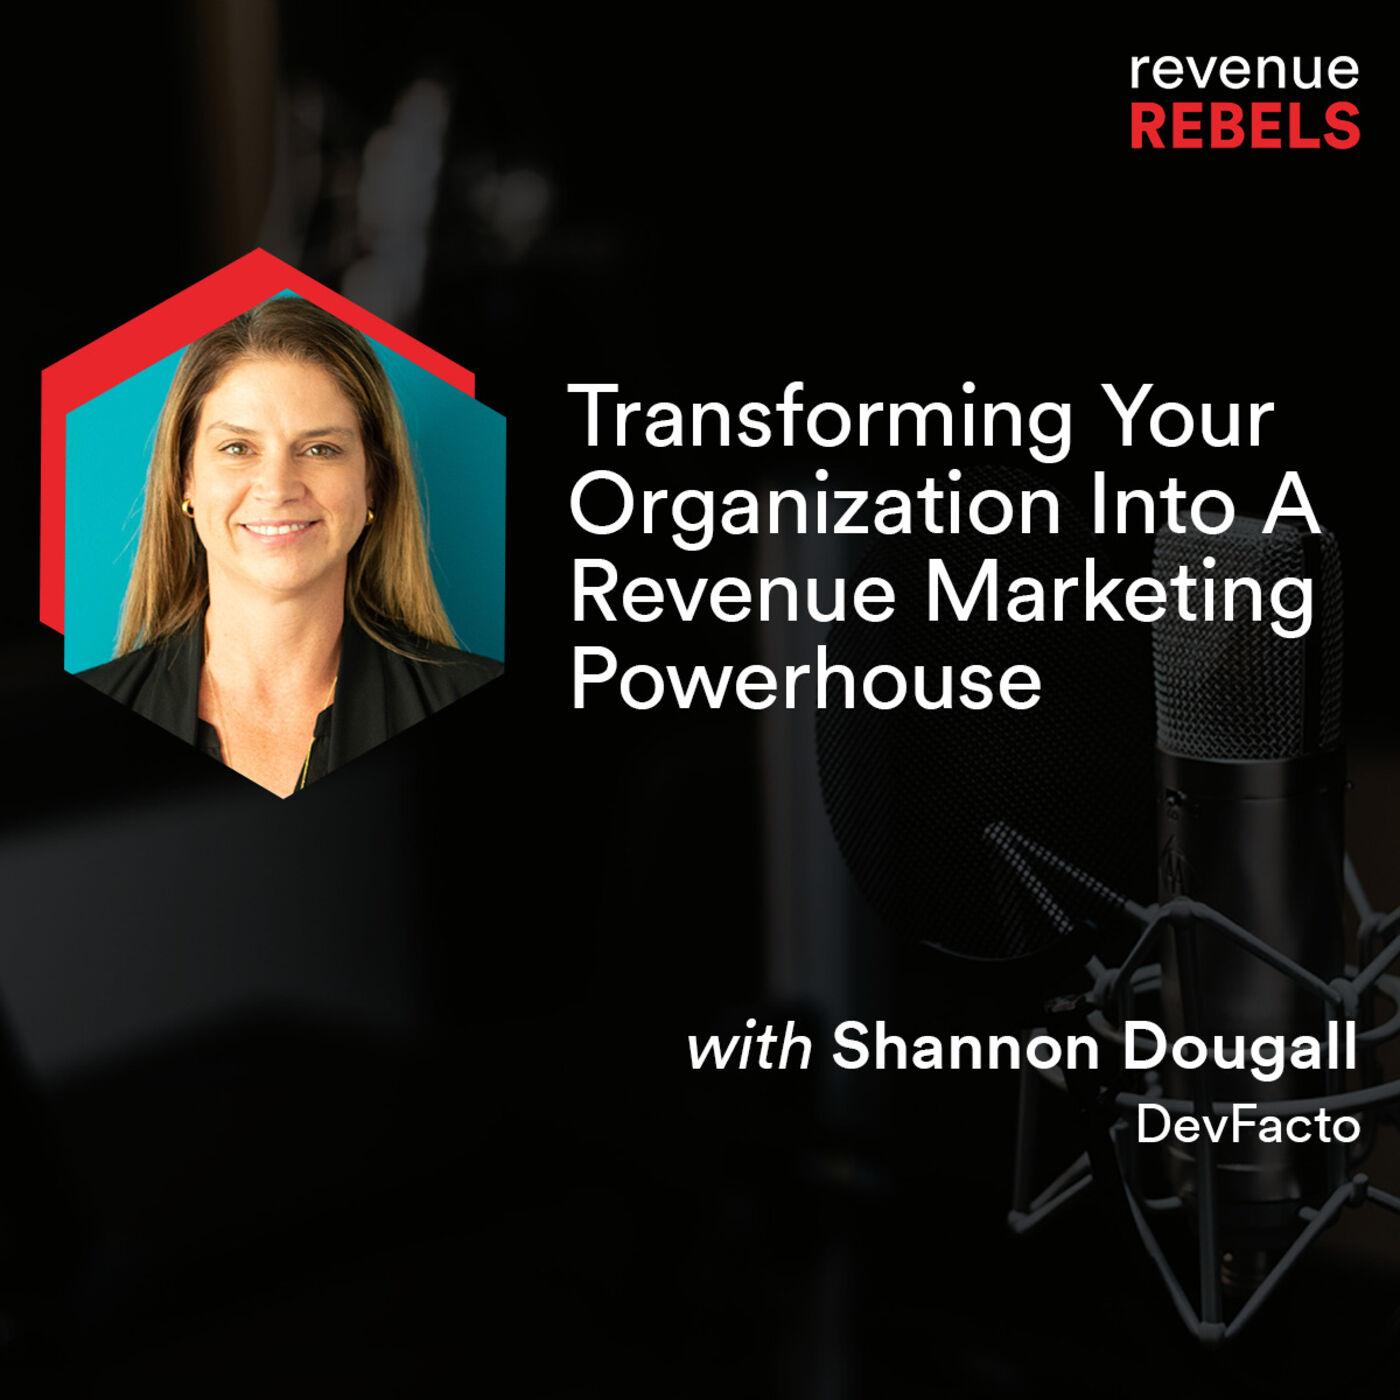 Transforming Your Organization into a Revenue Marketing Powerhouse